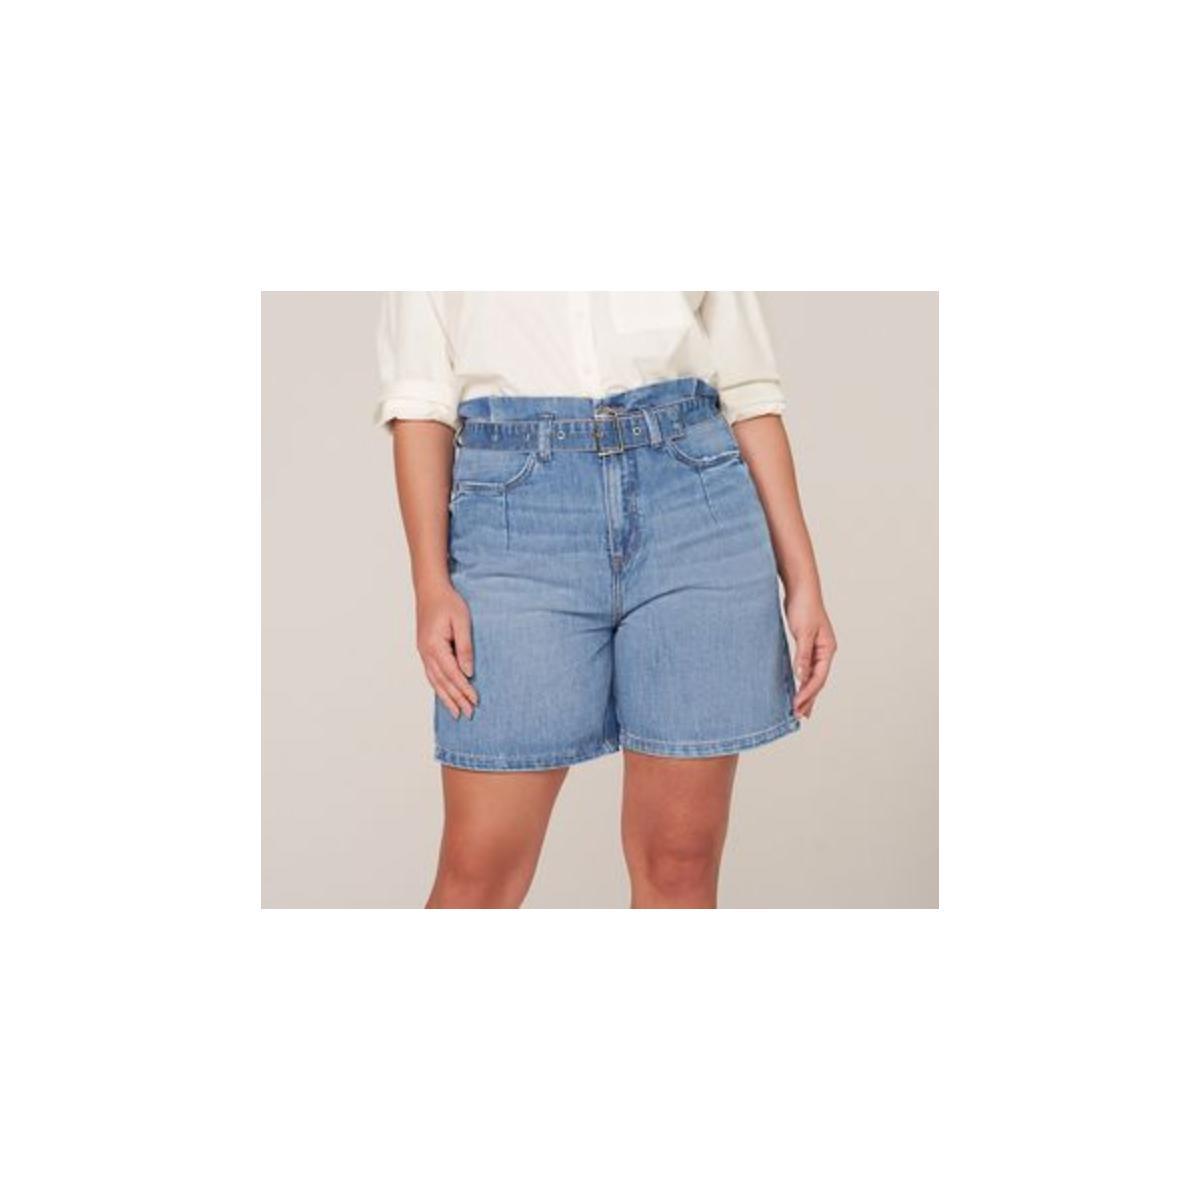 Bermuda Feminina Dzarm Zc4y 1asn  Jeans